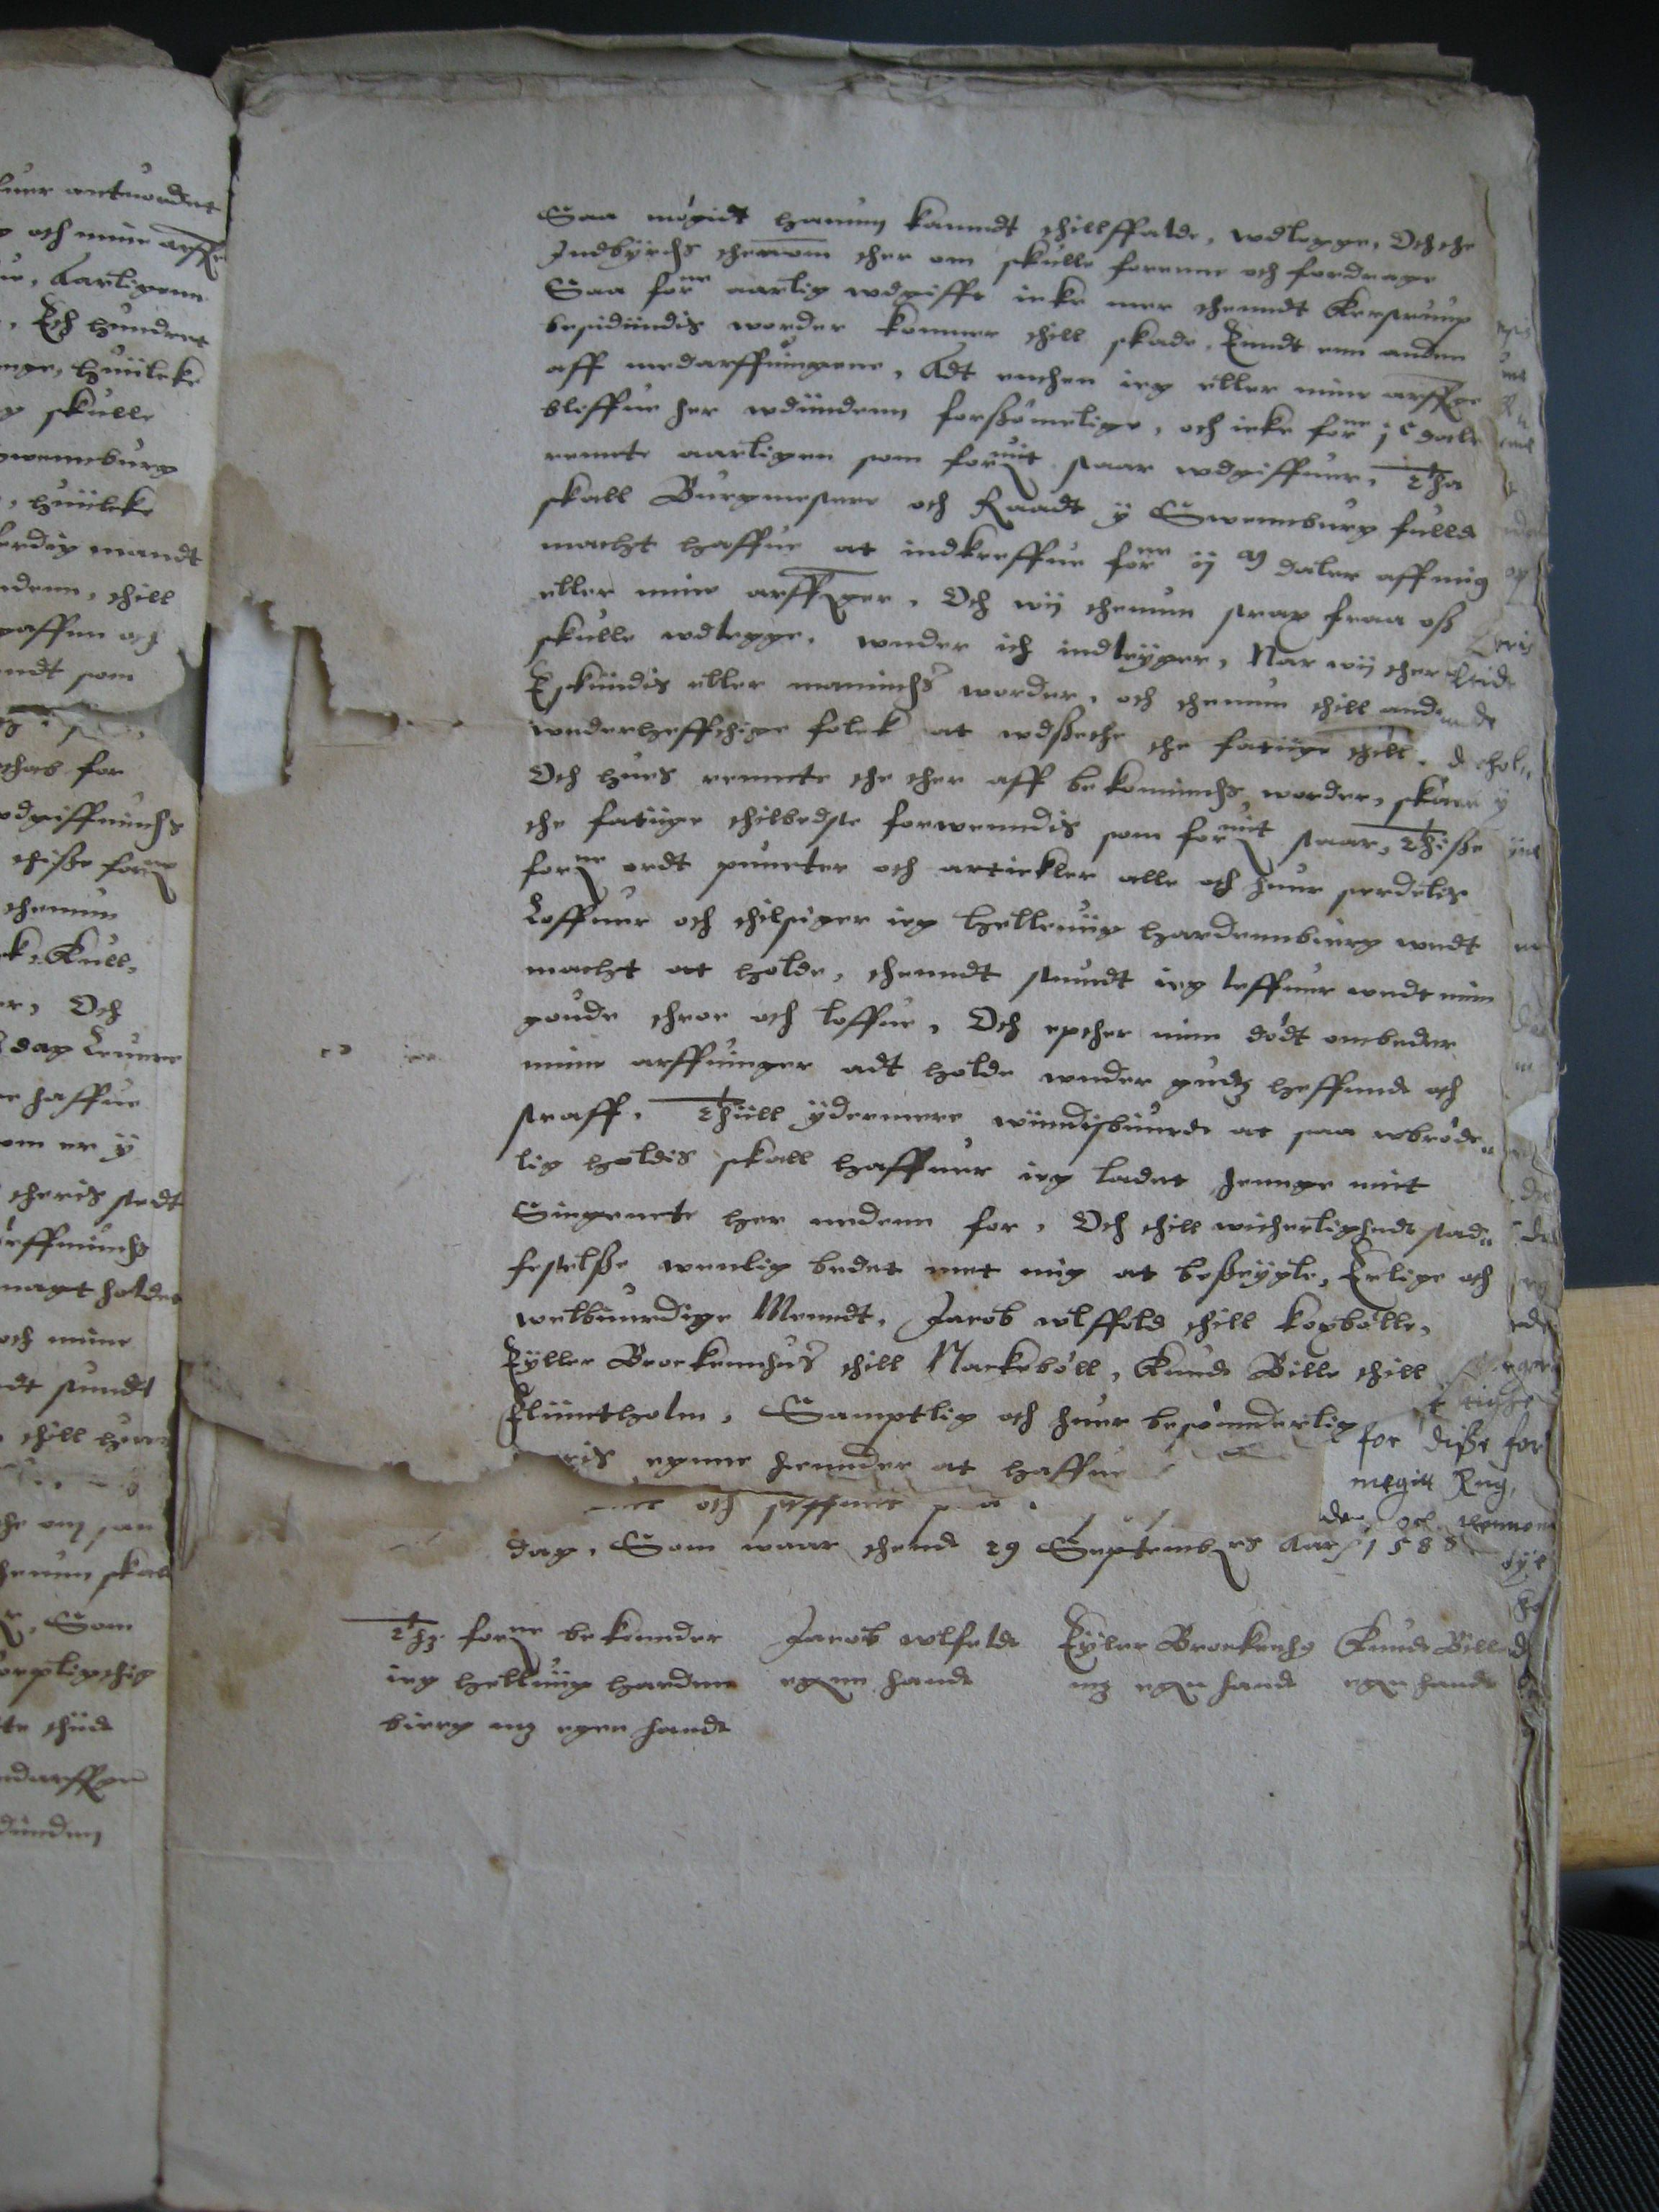 Fundats for Svendborg Hospital 1586 (3)